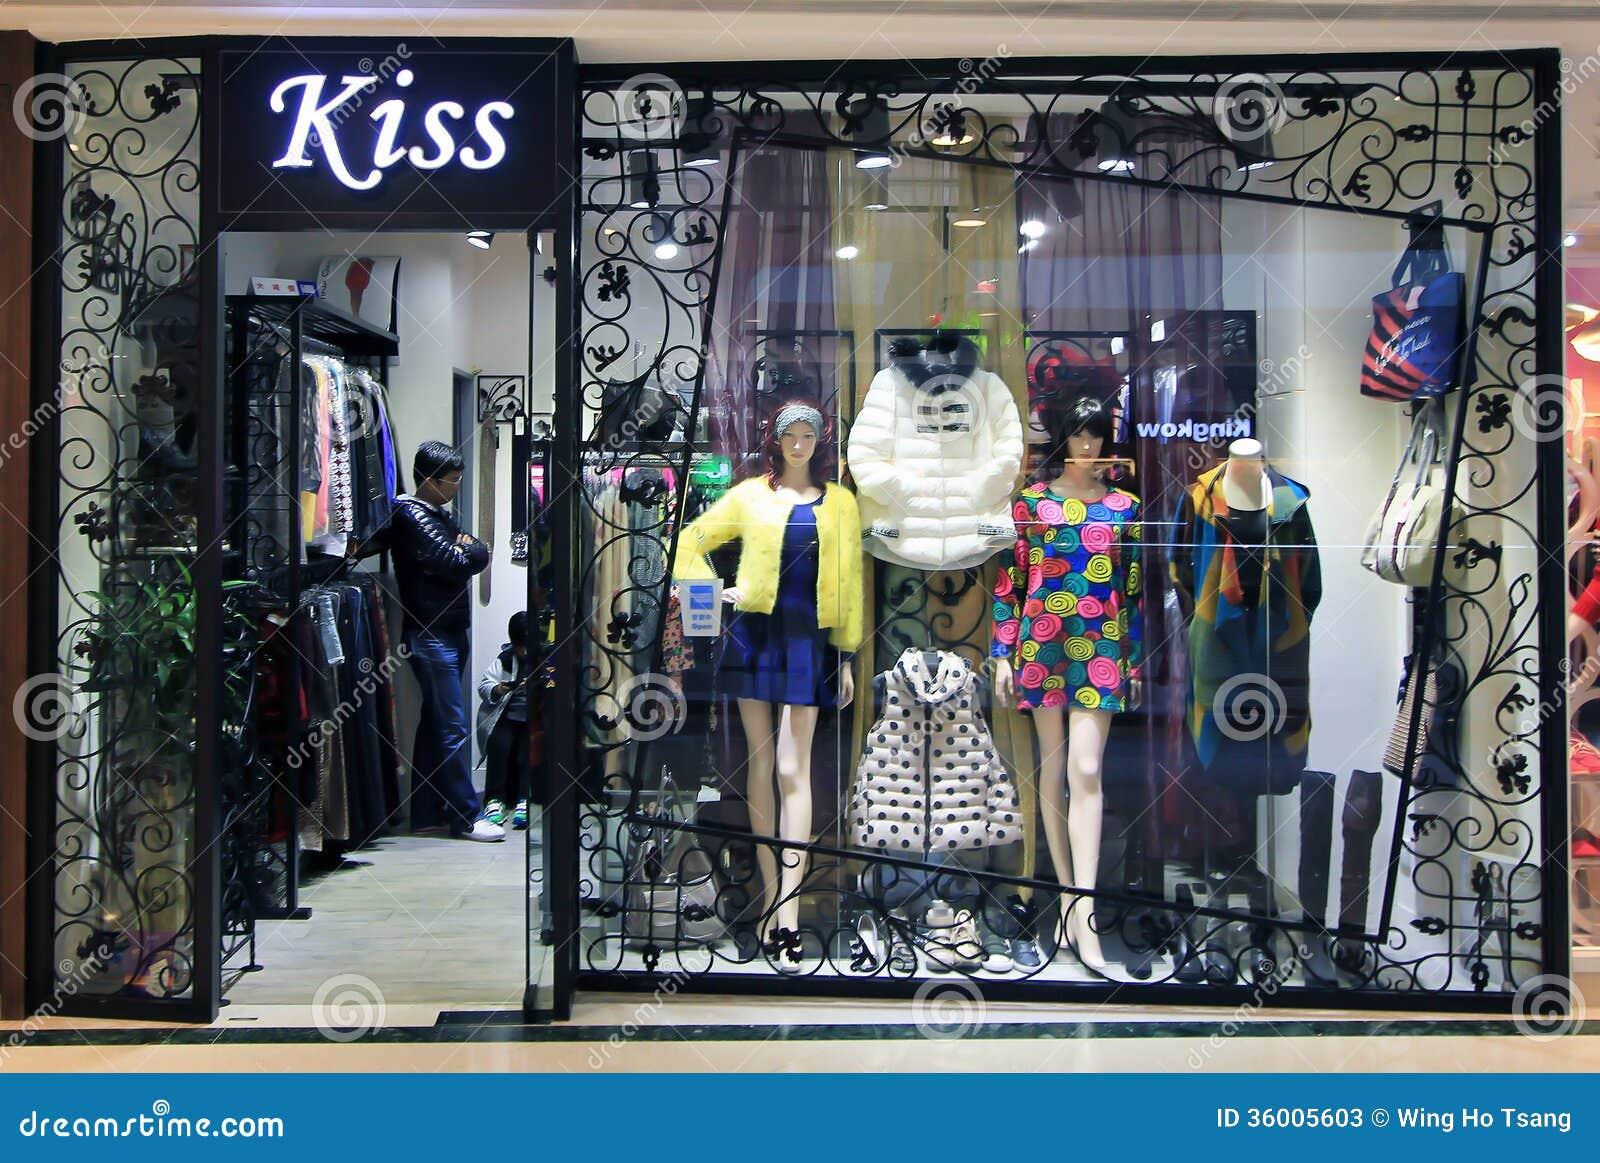 Hot kiss clothing store